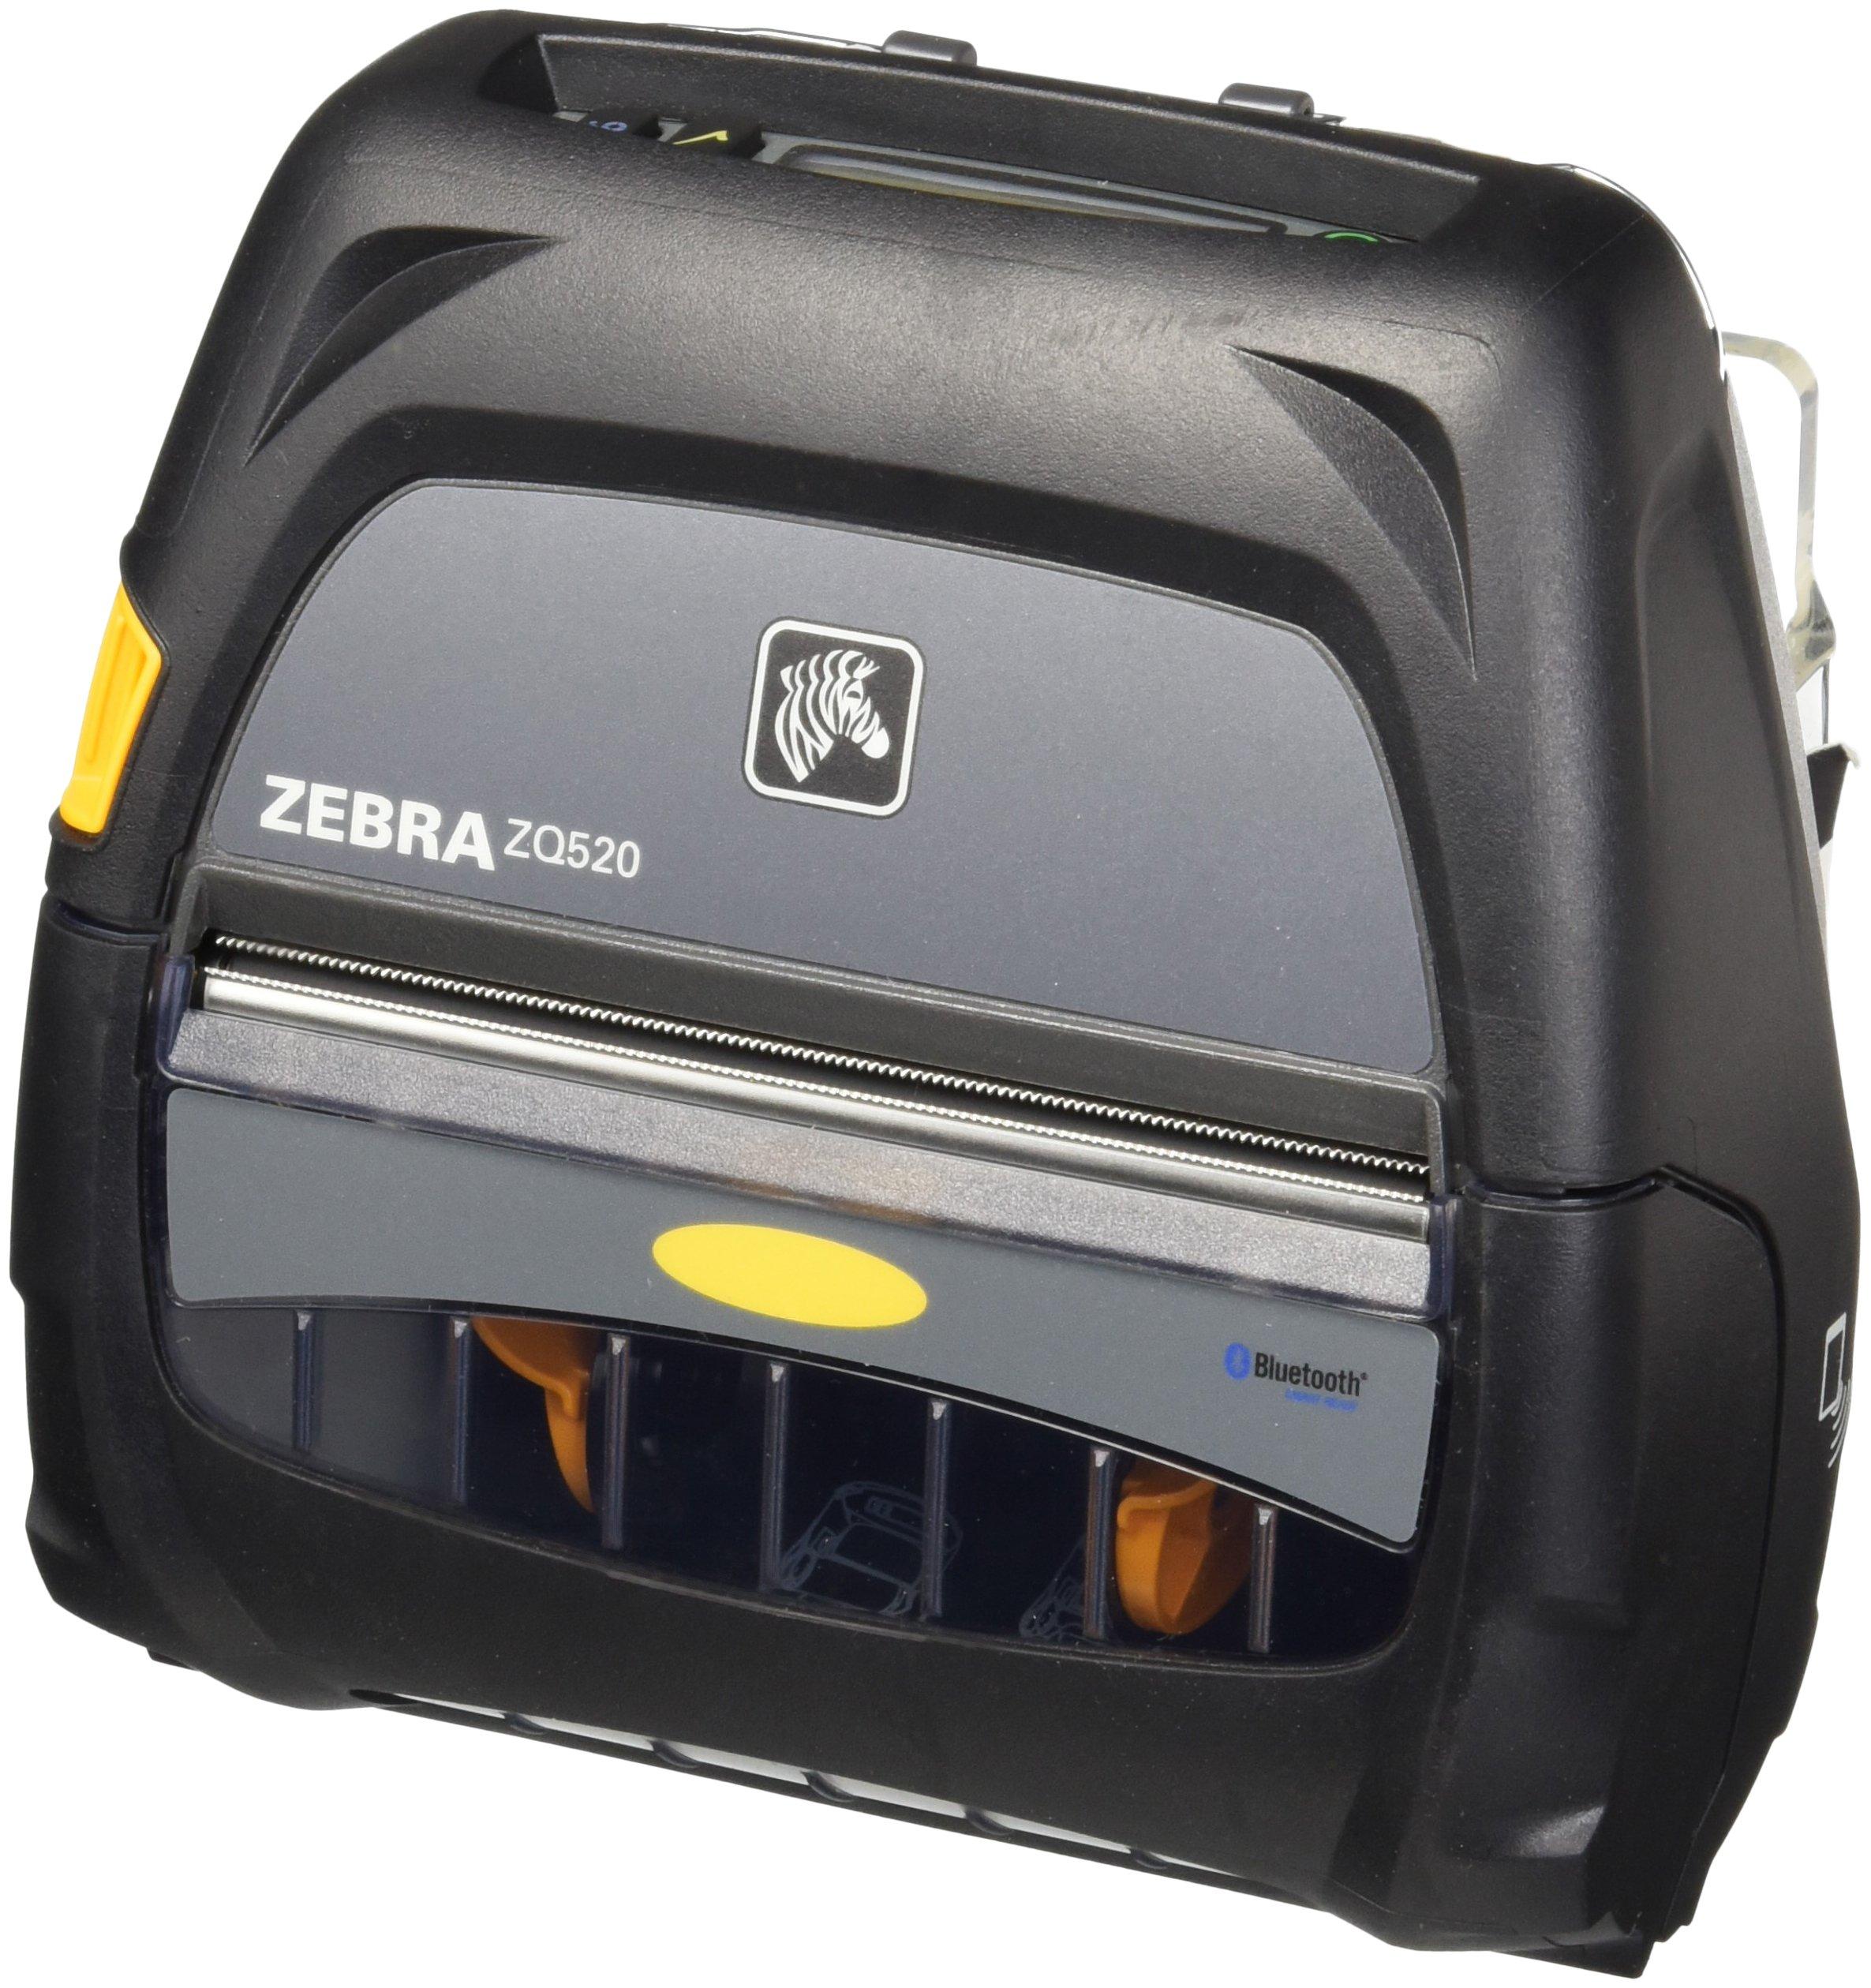 Zebra Technologies ZQ52-AUE0000-00 Thermal Printer, Portable, ZQ520, 4'' Size, Bluetooth 4.0, 203 DPI